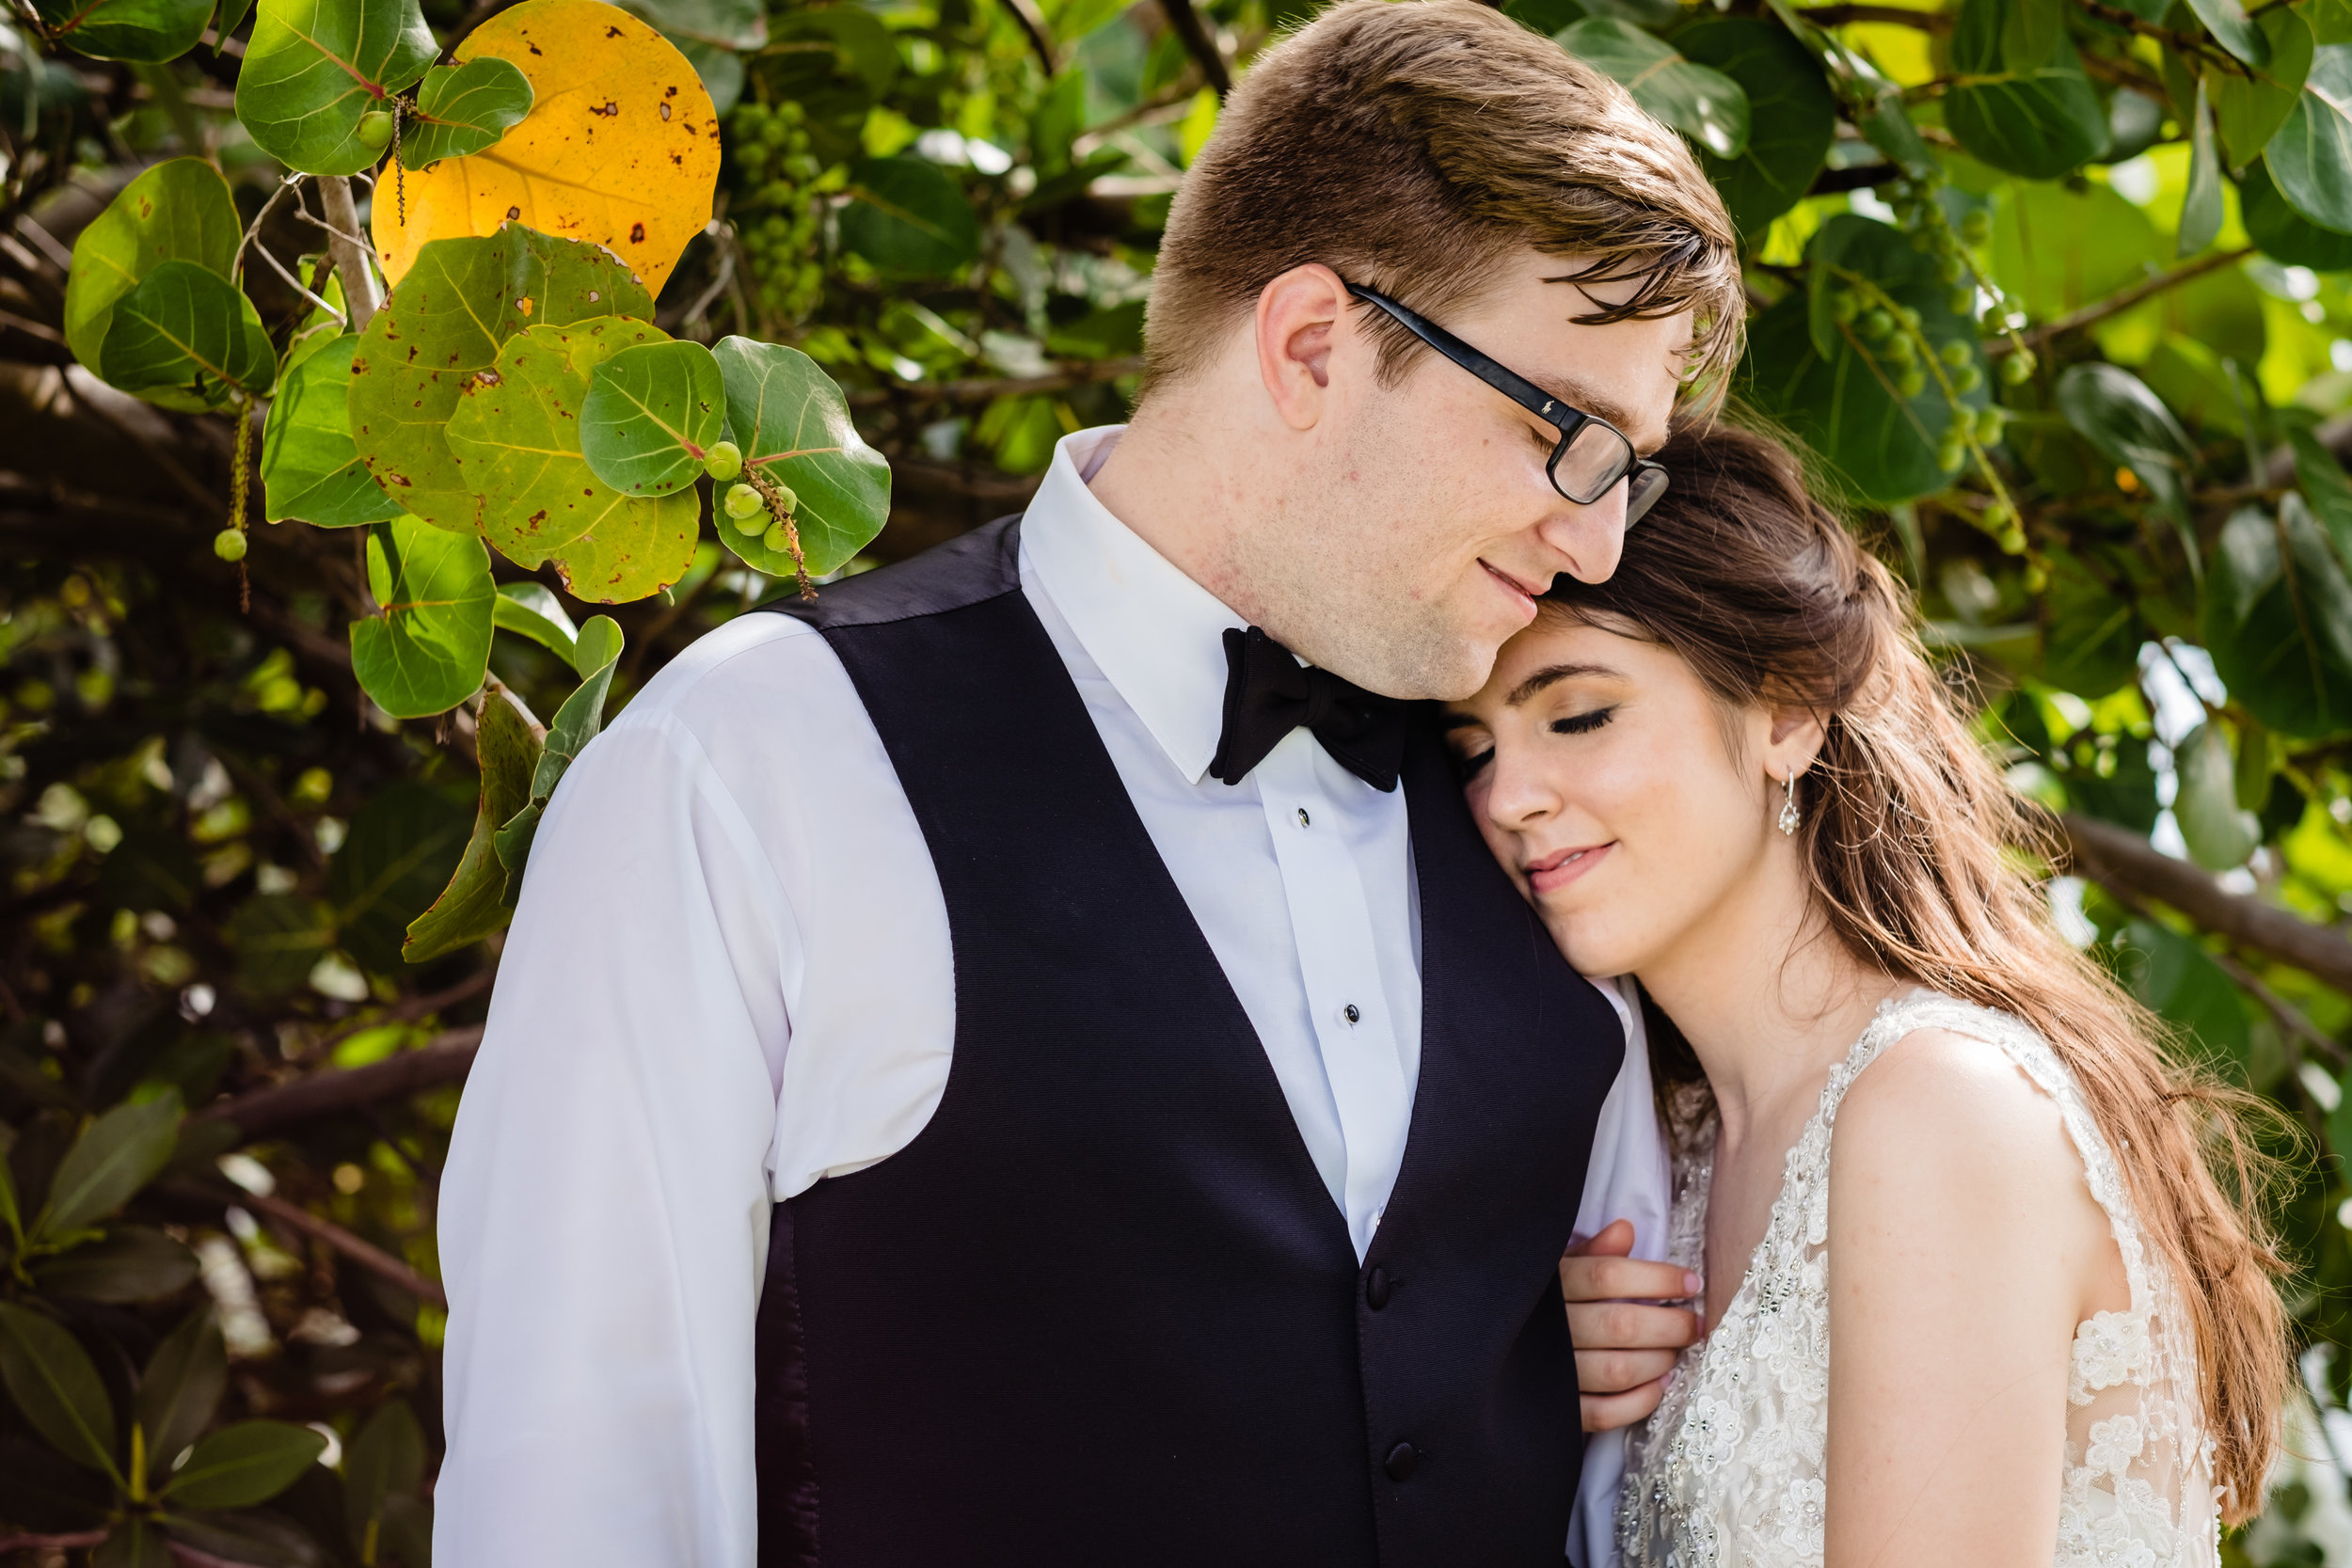 HAH_Zoe and Daniel_Clearwater Wedding_610_2018.jpg